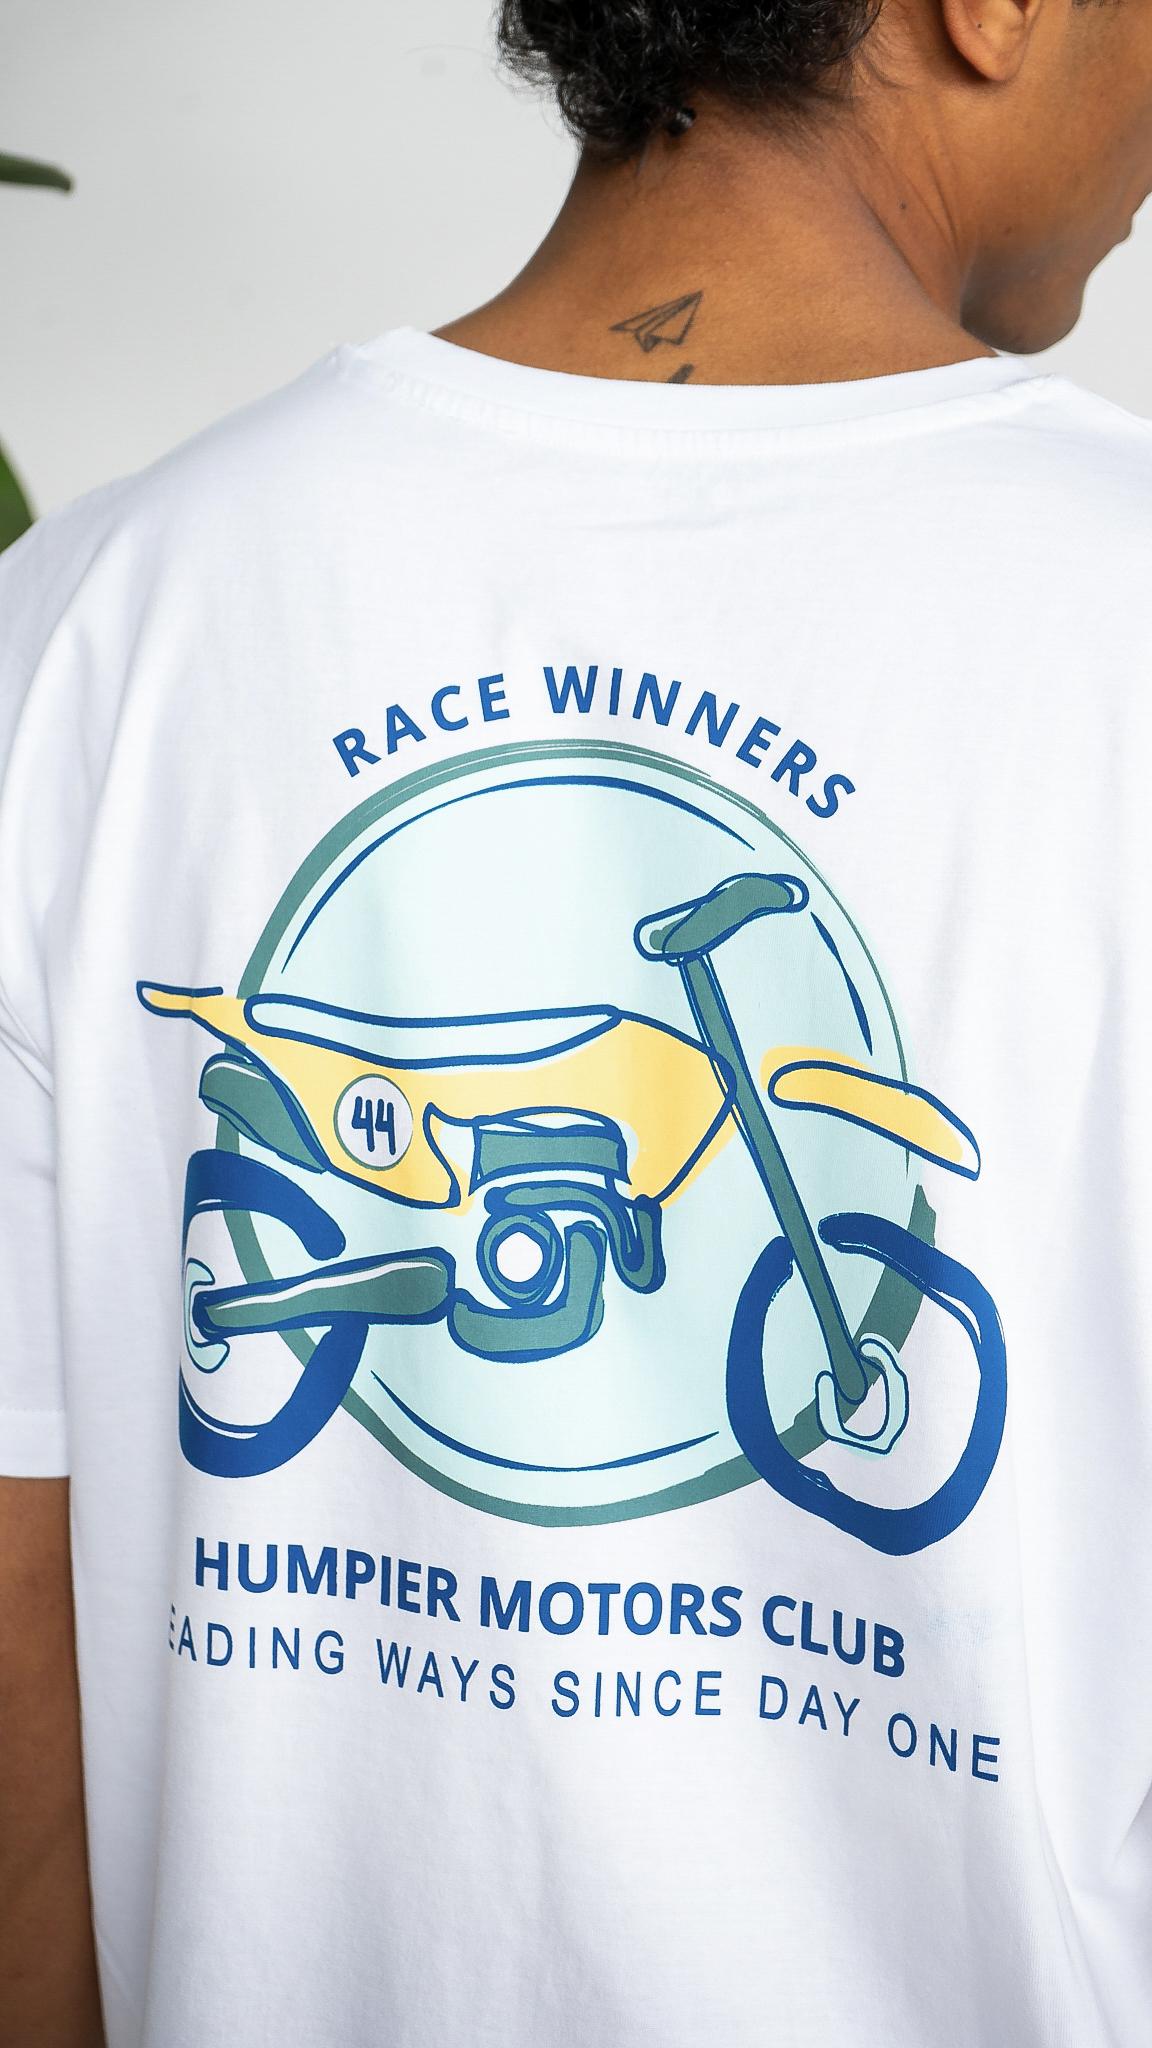 Camiseta Race Winners | Humpier | Edición limitada